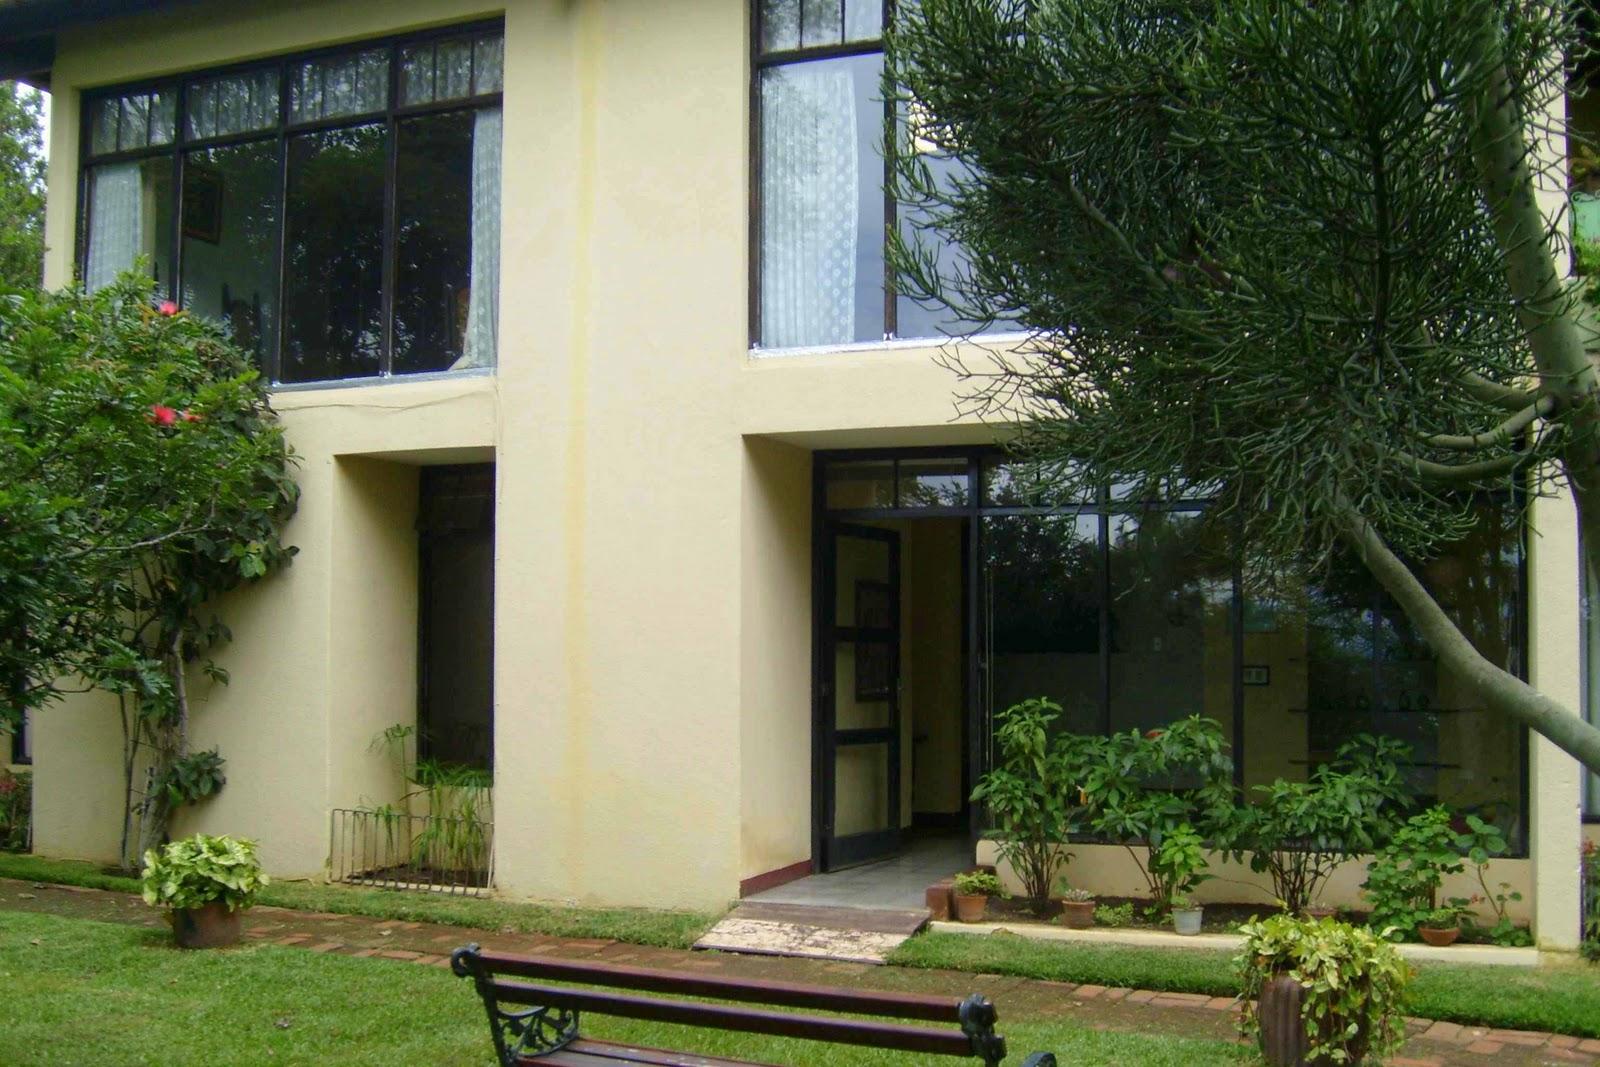 Inversi n rentable inmobiliaria cv20104 inversiones for Boulevard inmobiliaria ciudad jardin